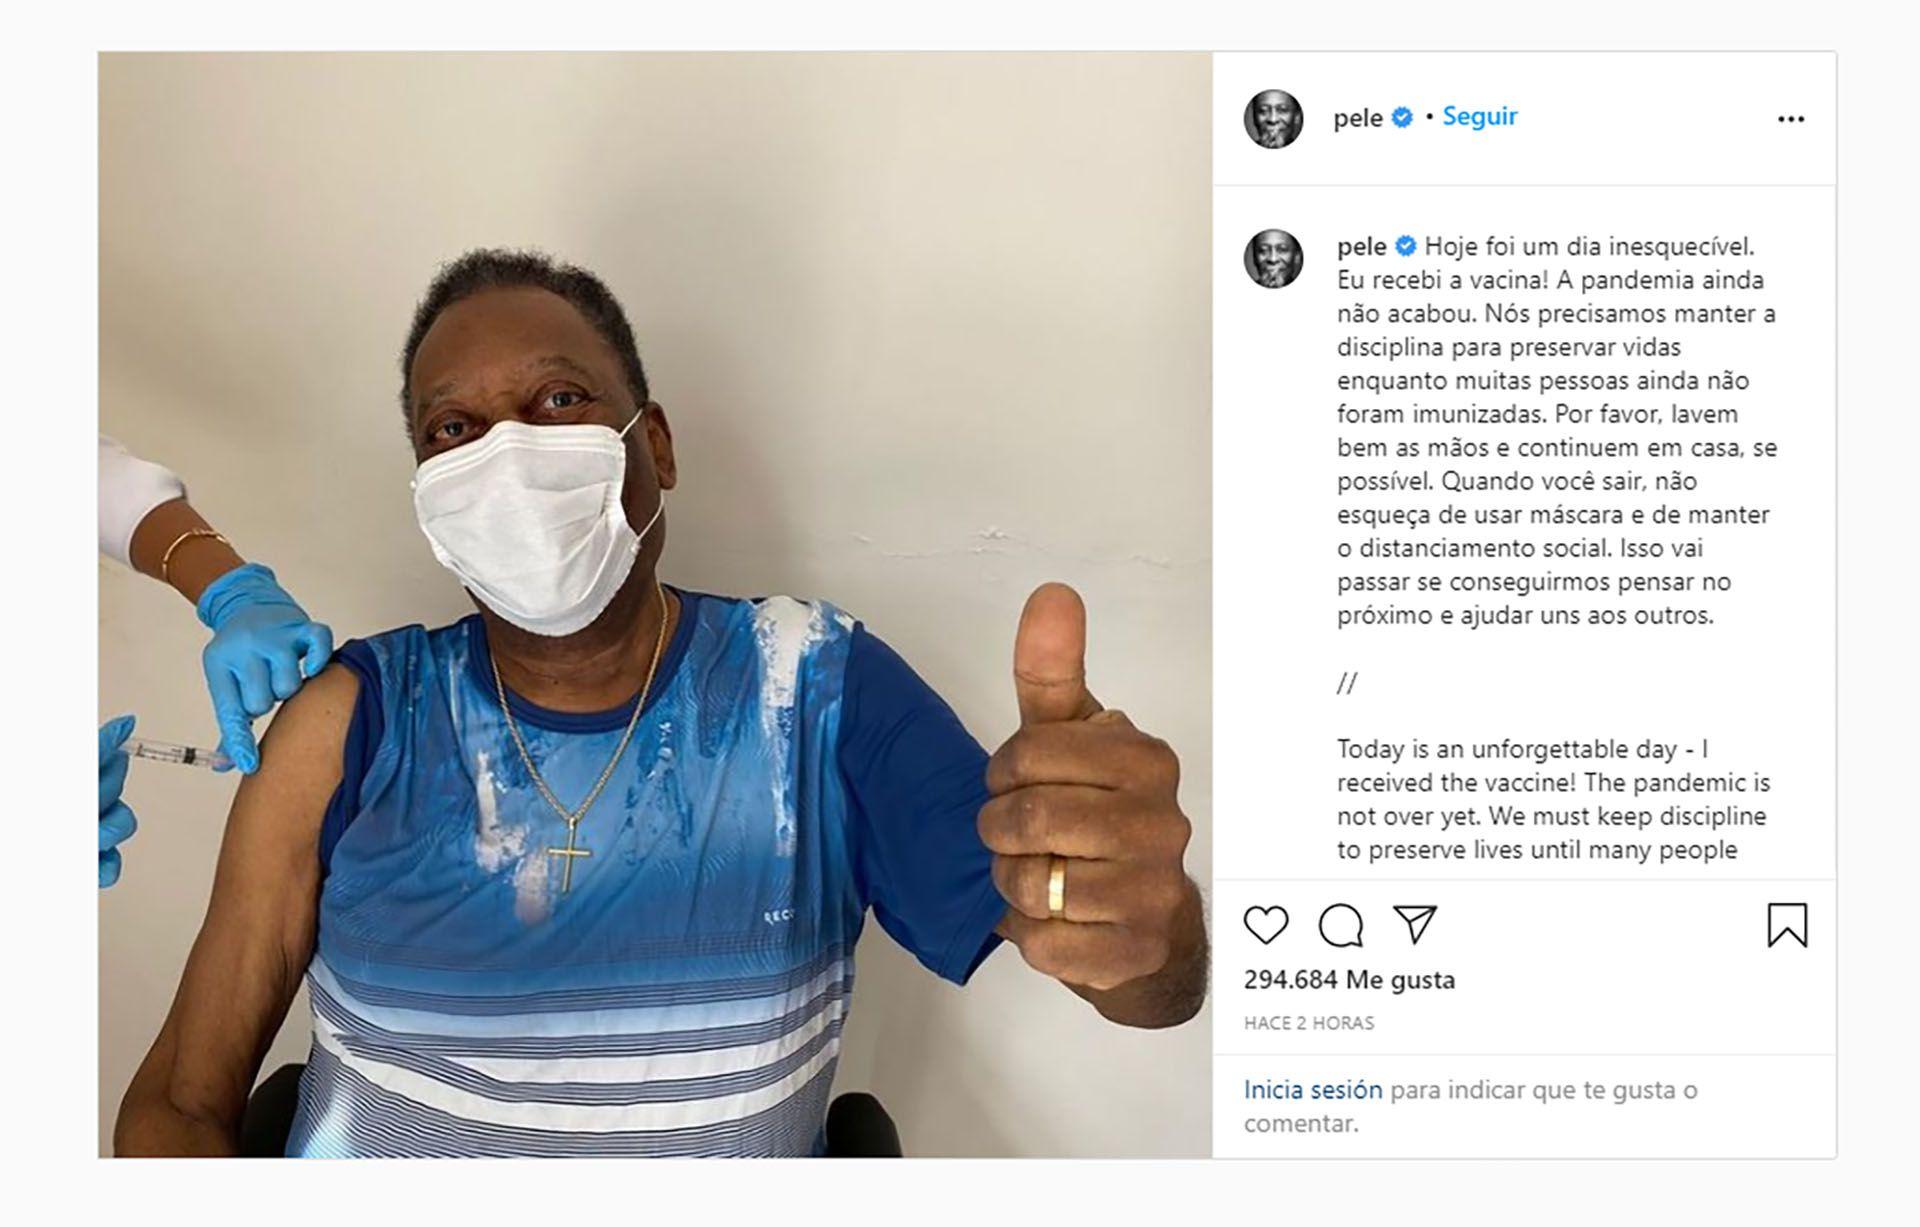 Pelé Instagram